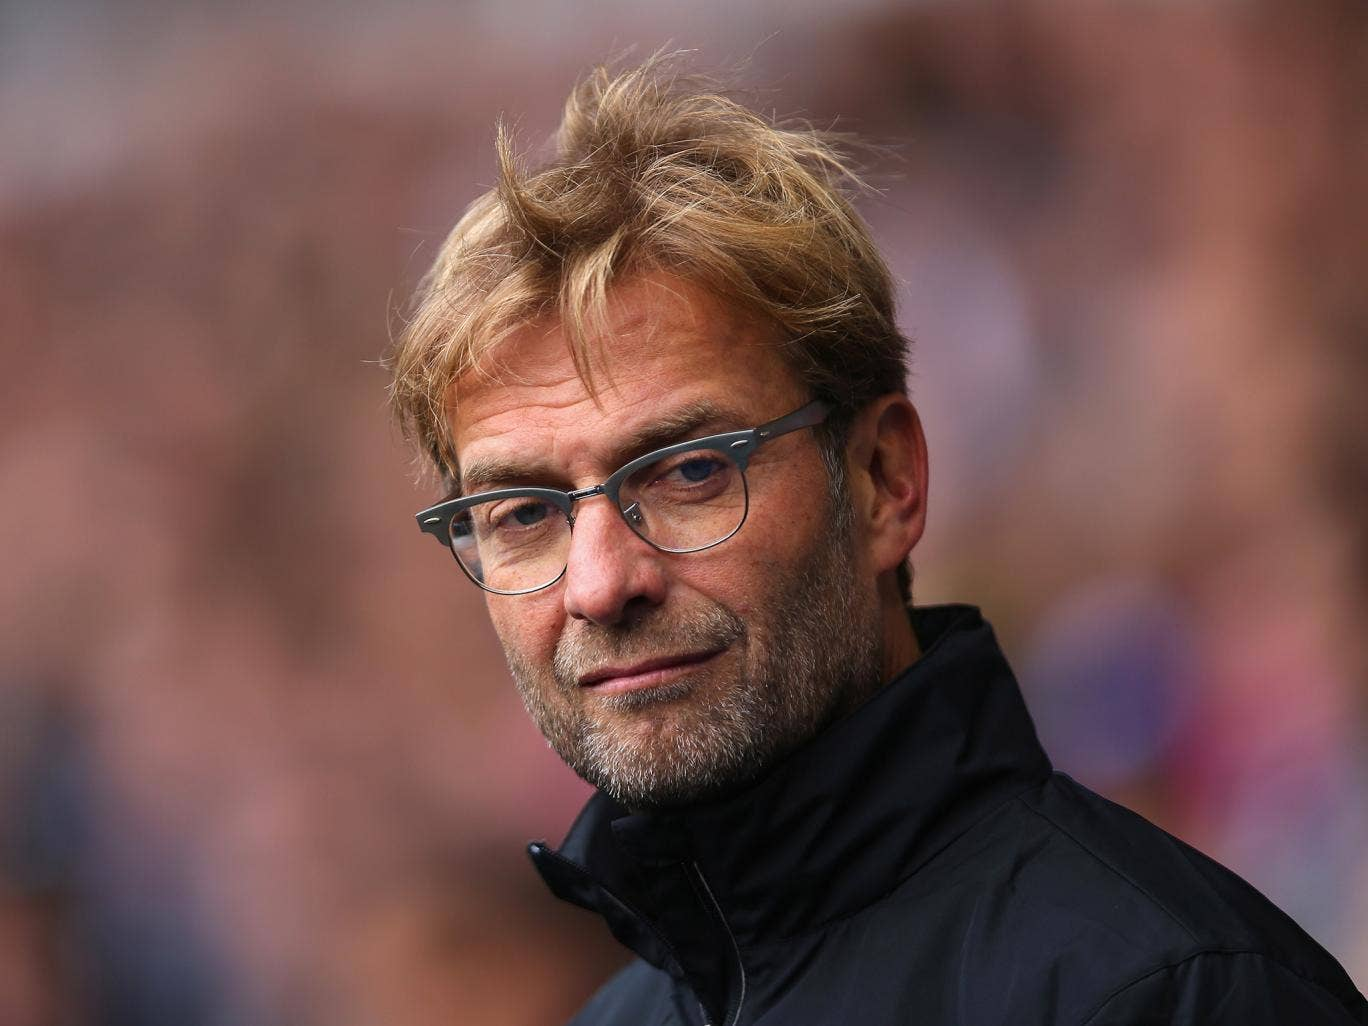 Jurgen Klopp Has Given Liverpool Fans Hope That Success Is